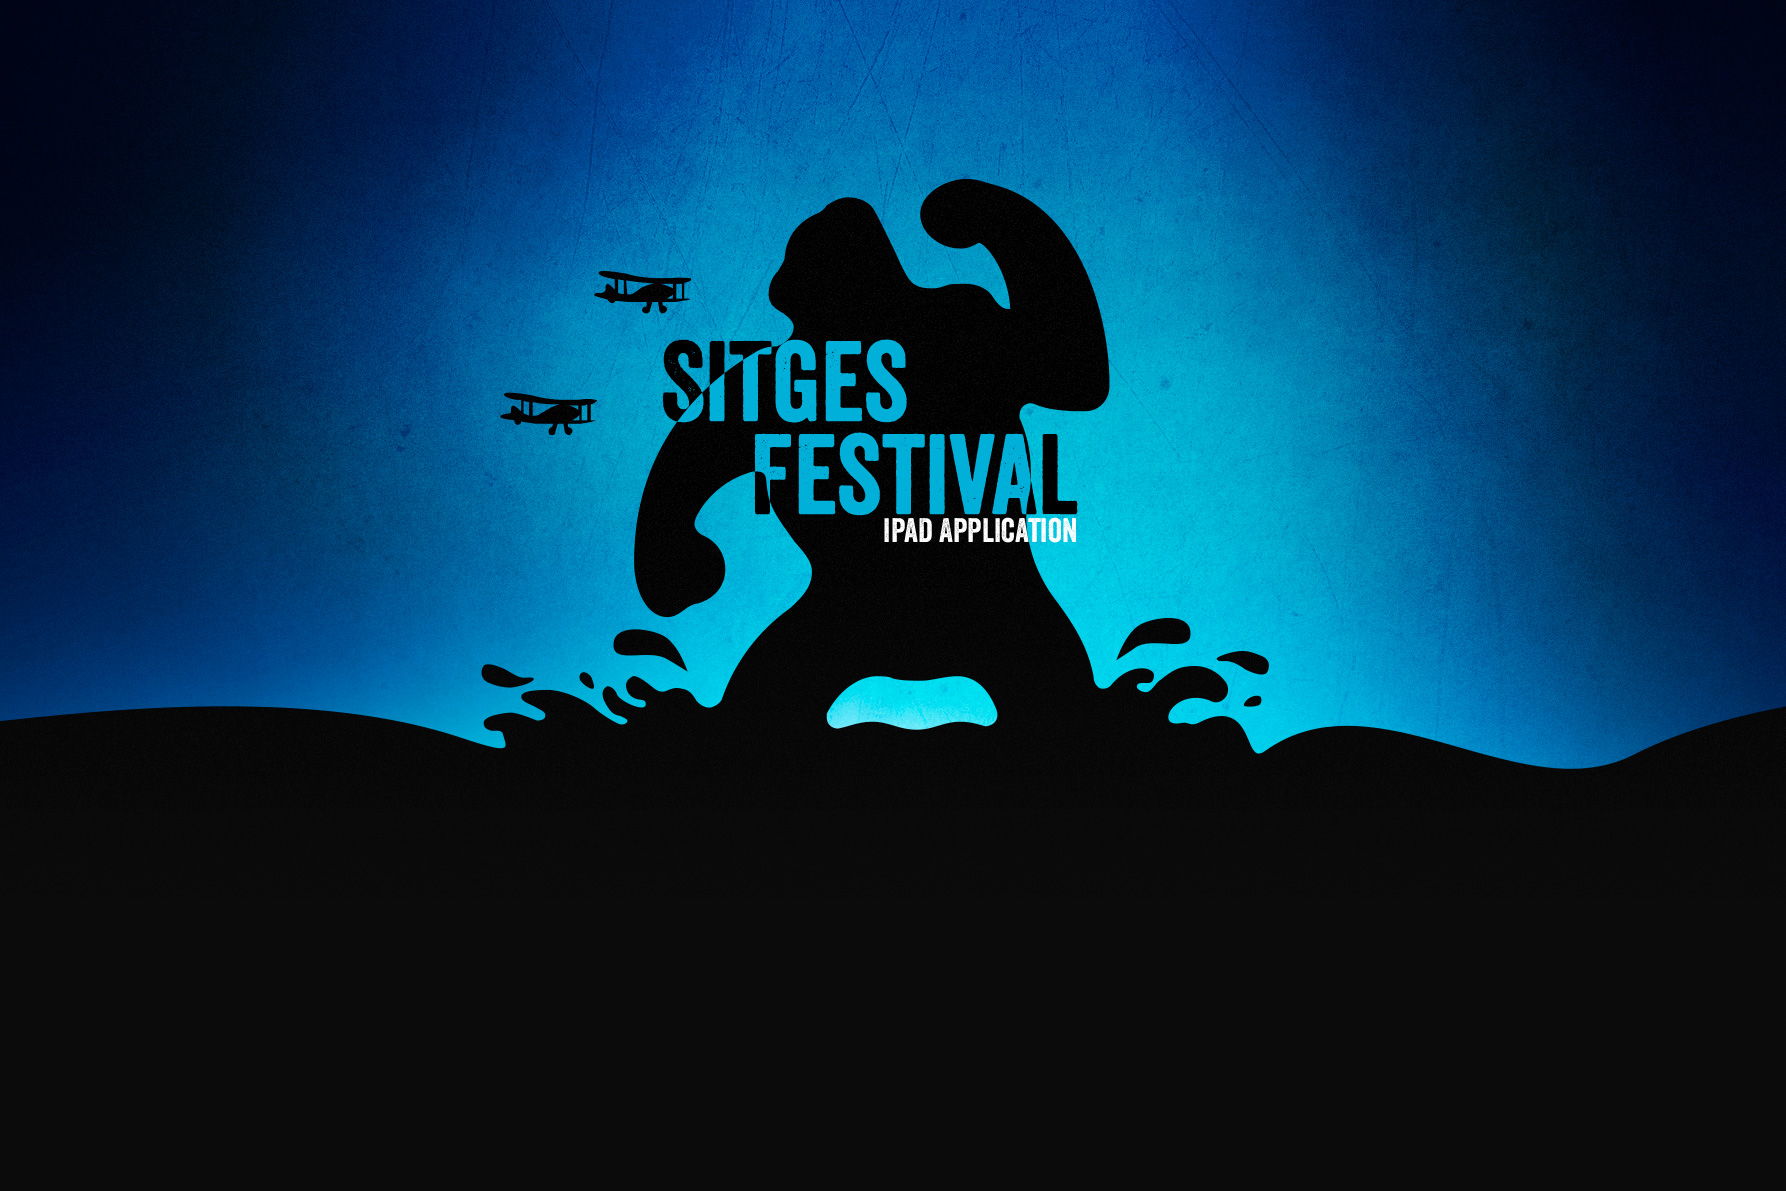 Sitges Film Festival – iPad App